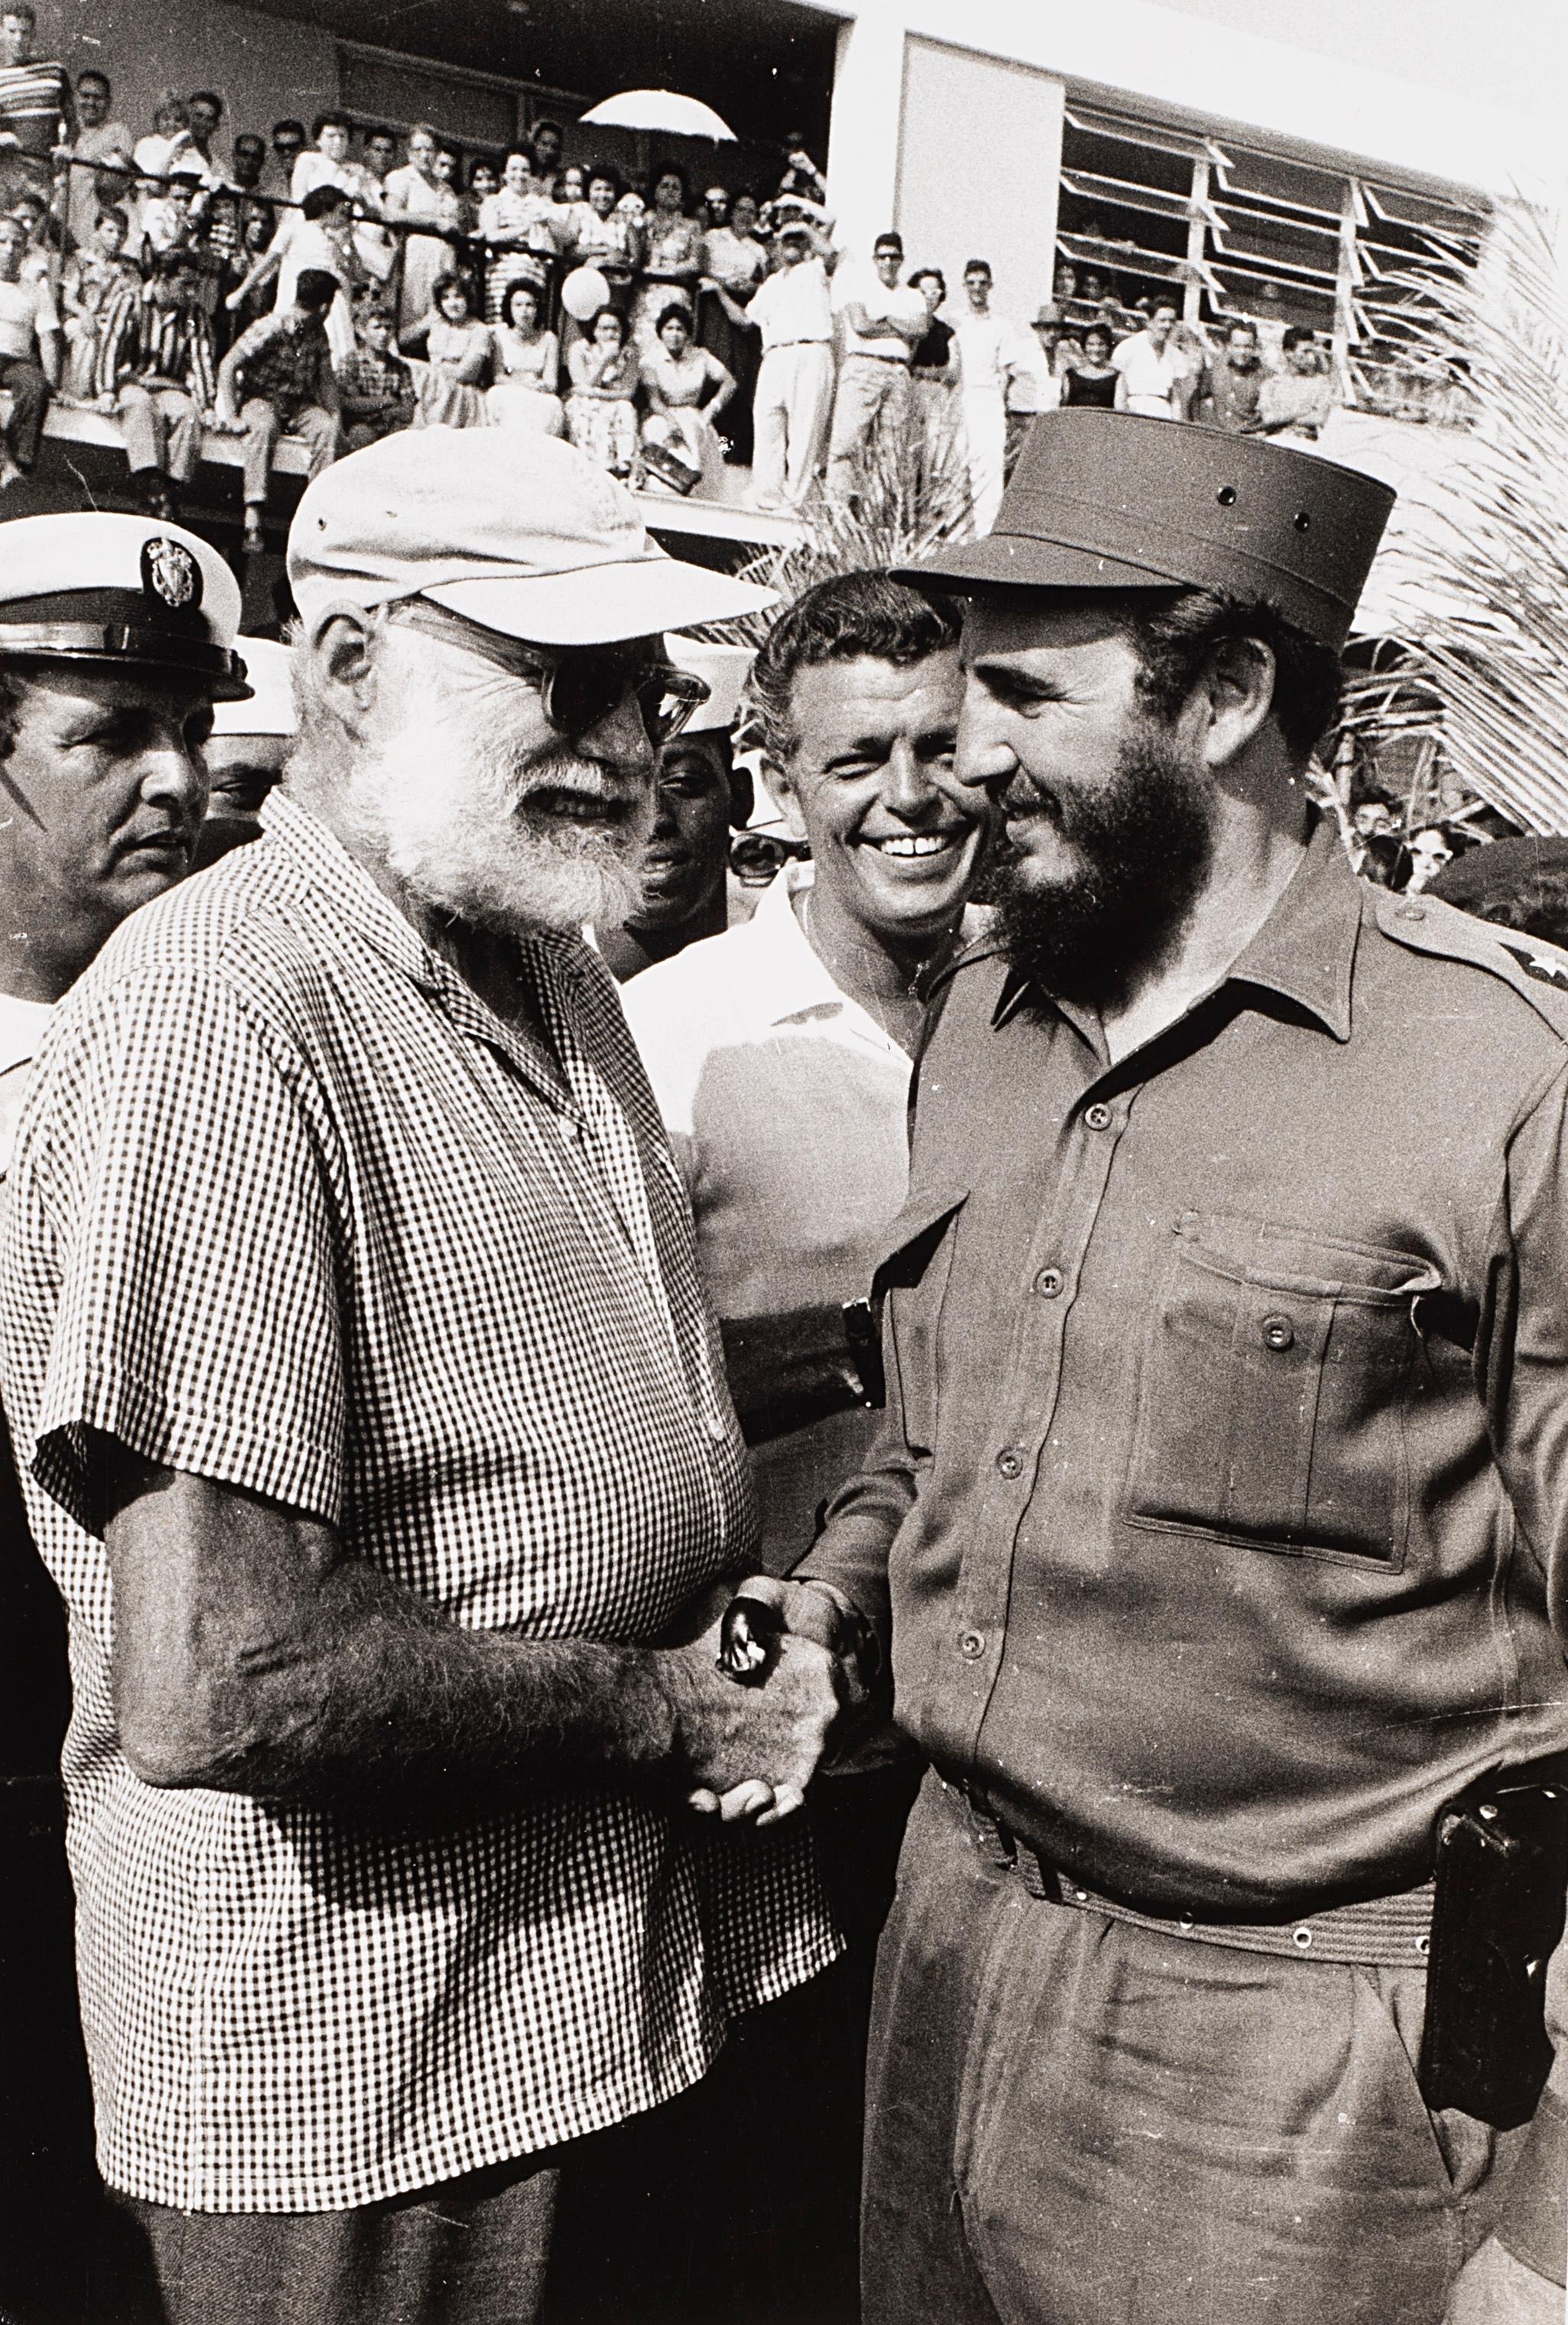 Korda Alberto | Che Guevara & Fidel Castro, Ernest Hemingway Marlin Fishing Contest, Cuba 1960 | MutualArt